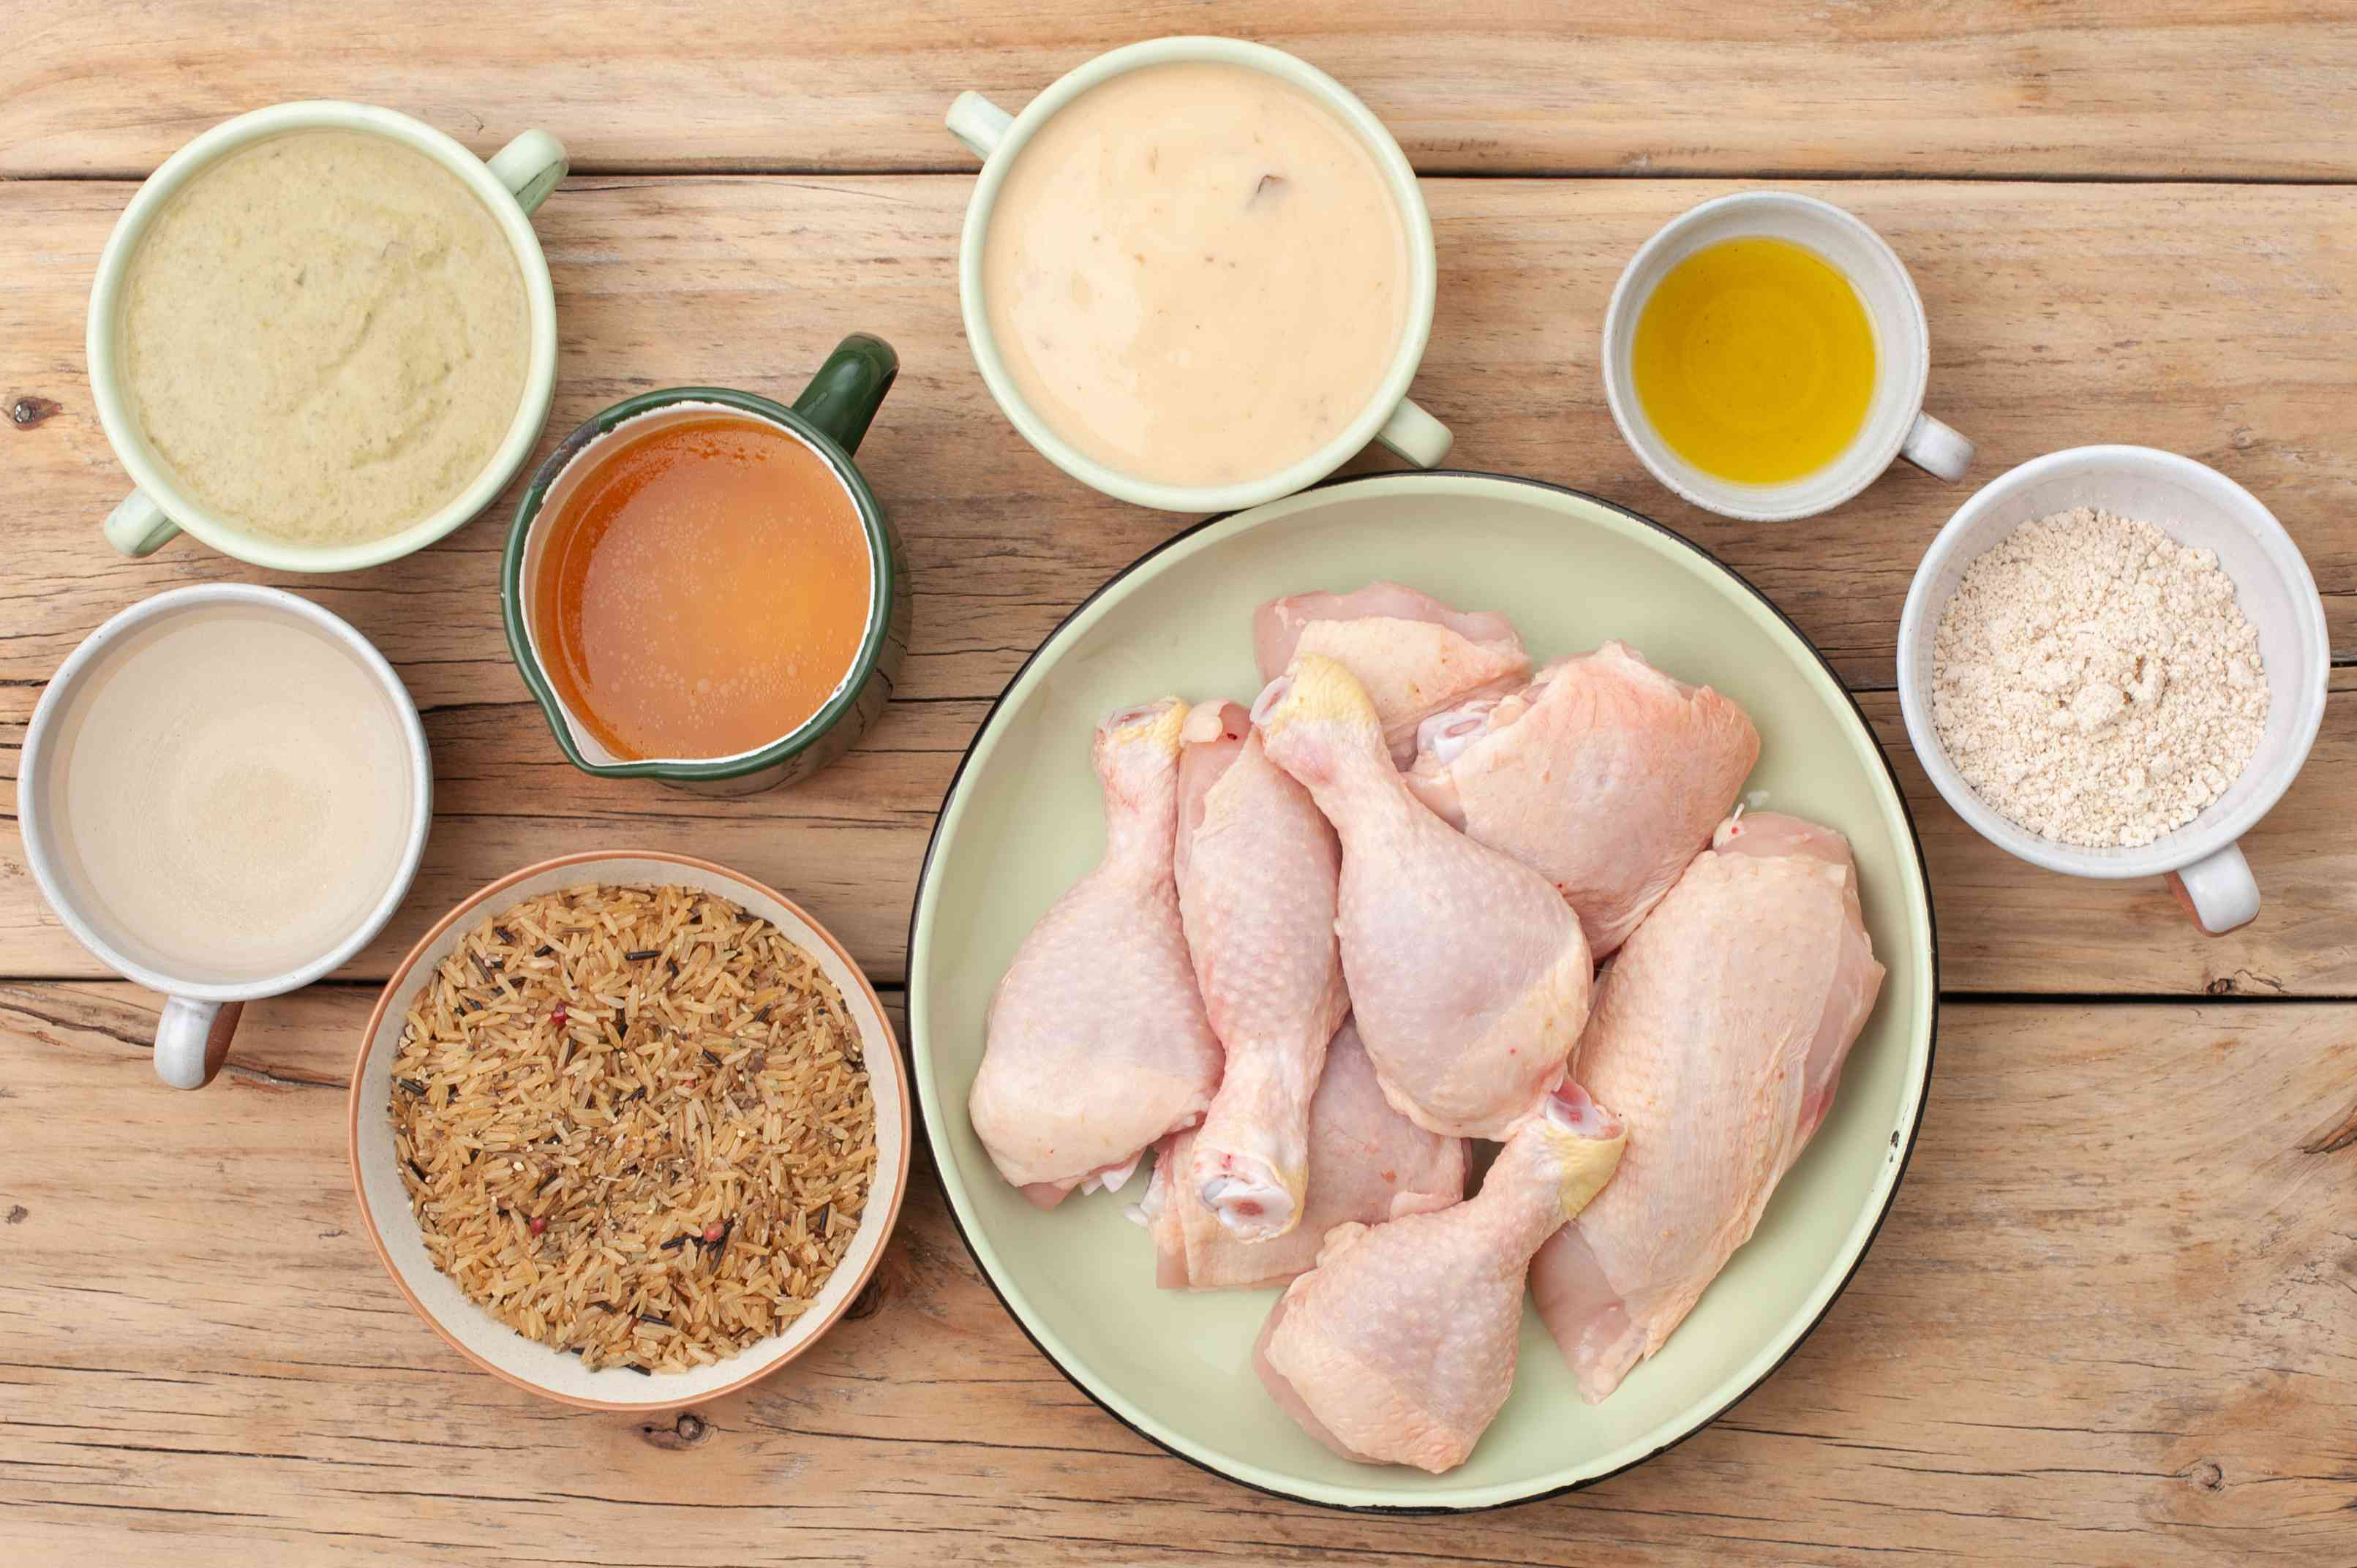 Ingredients for no peek chicken